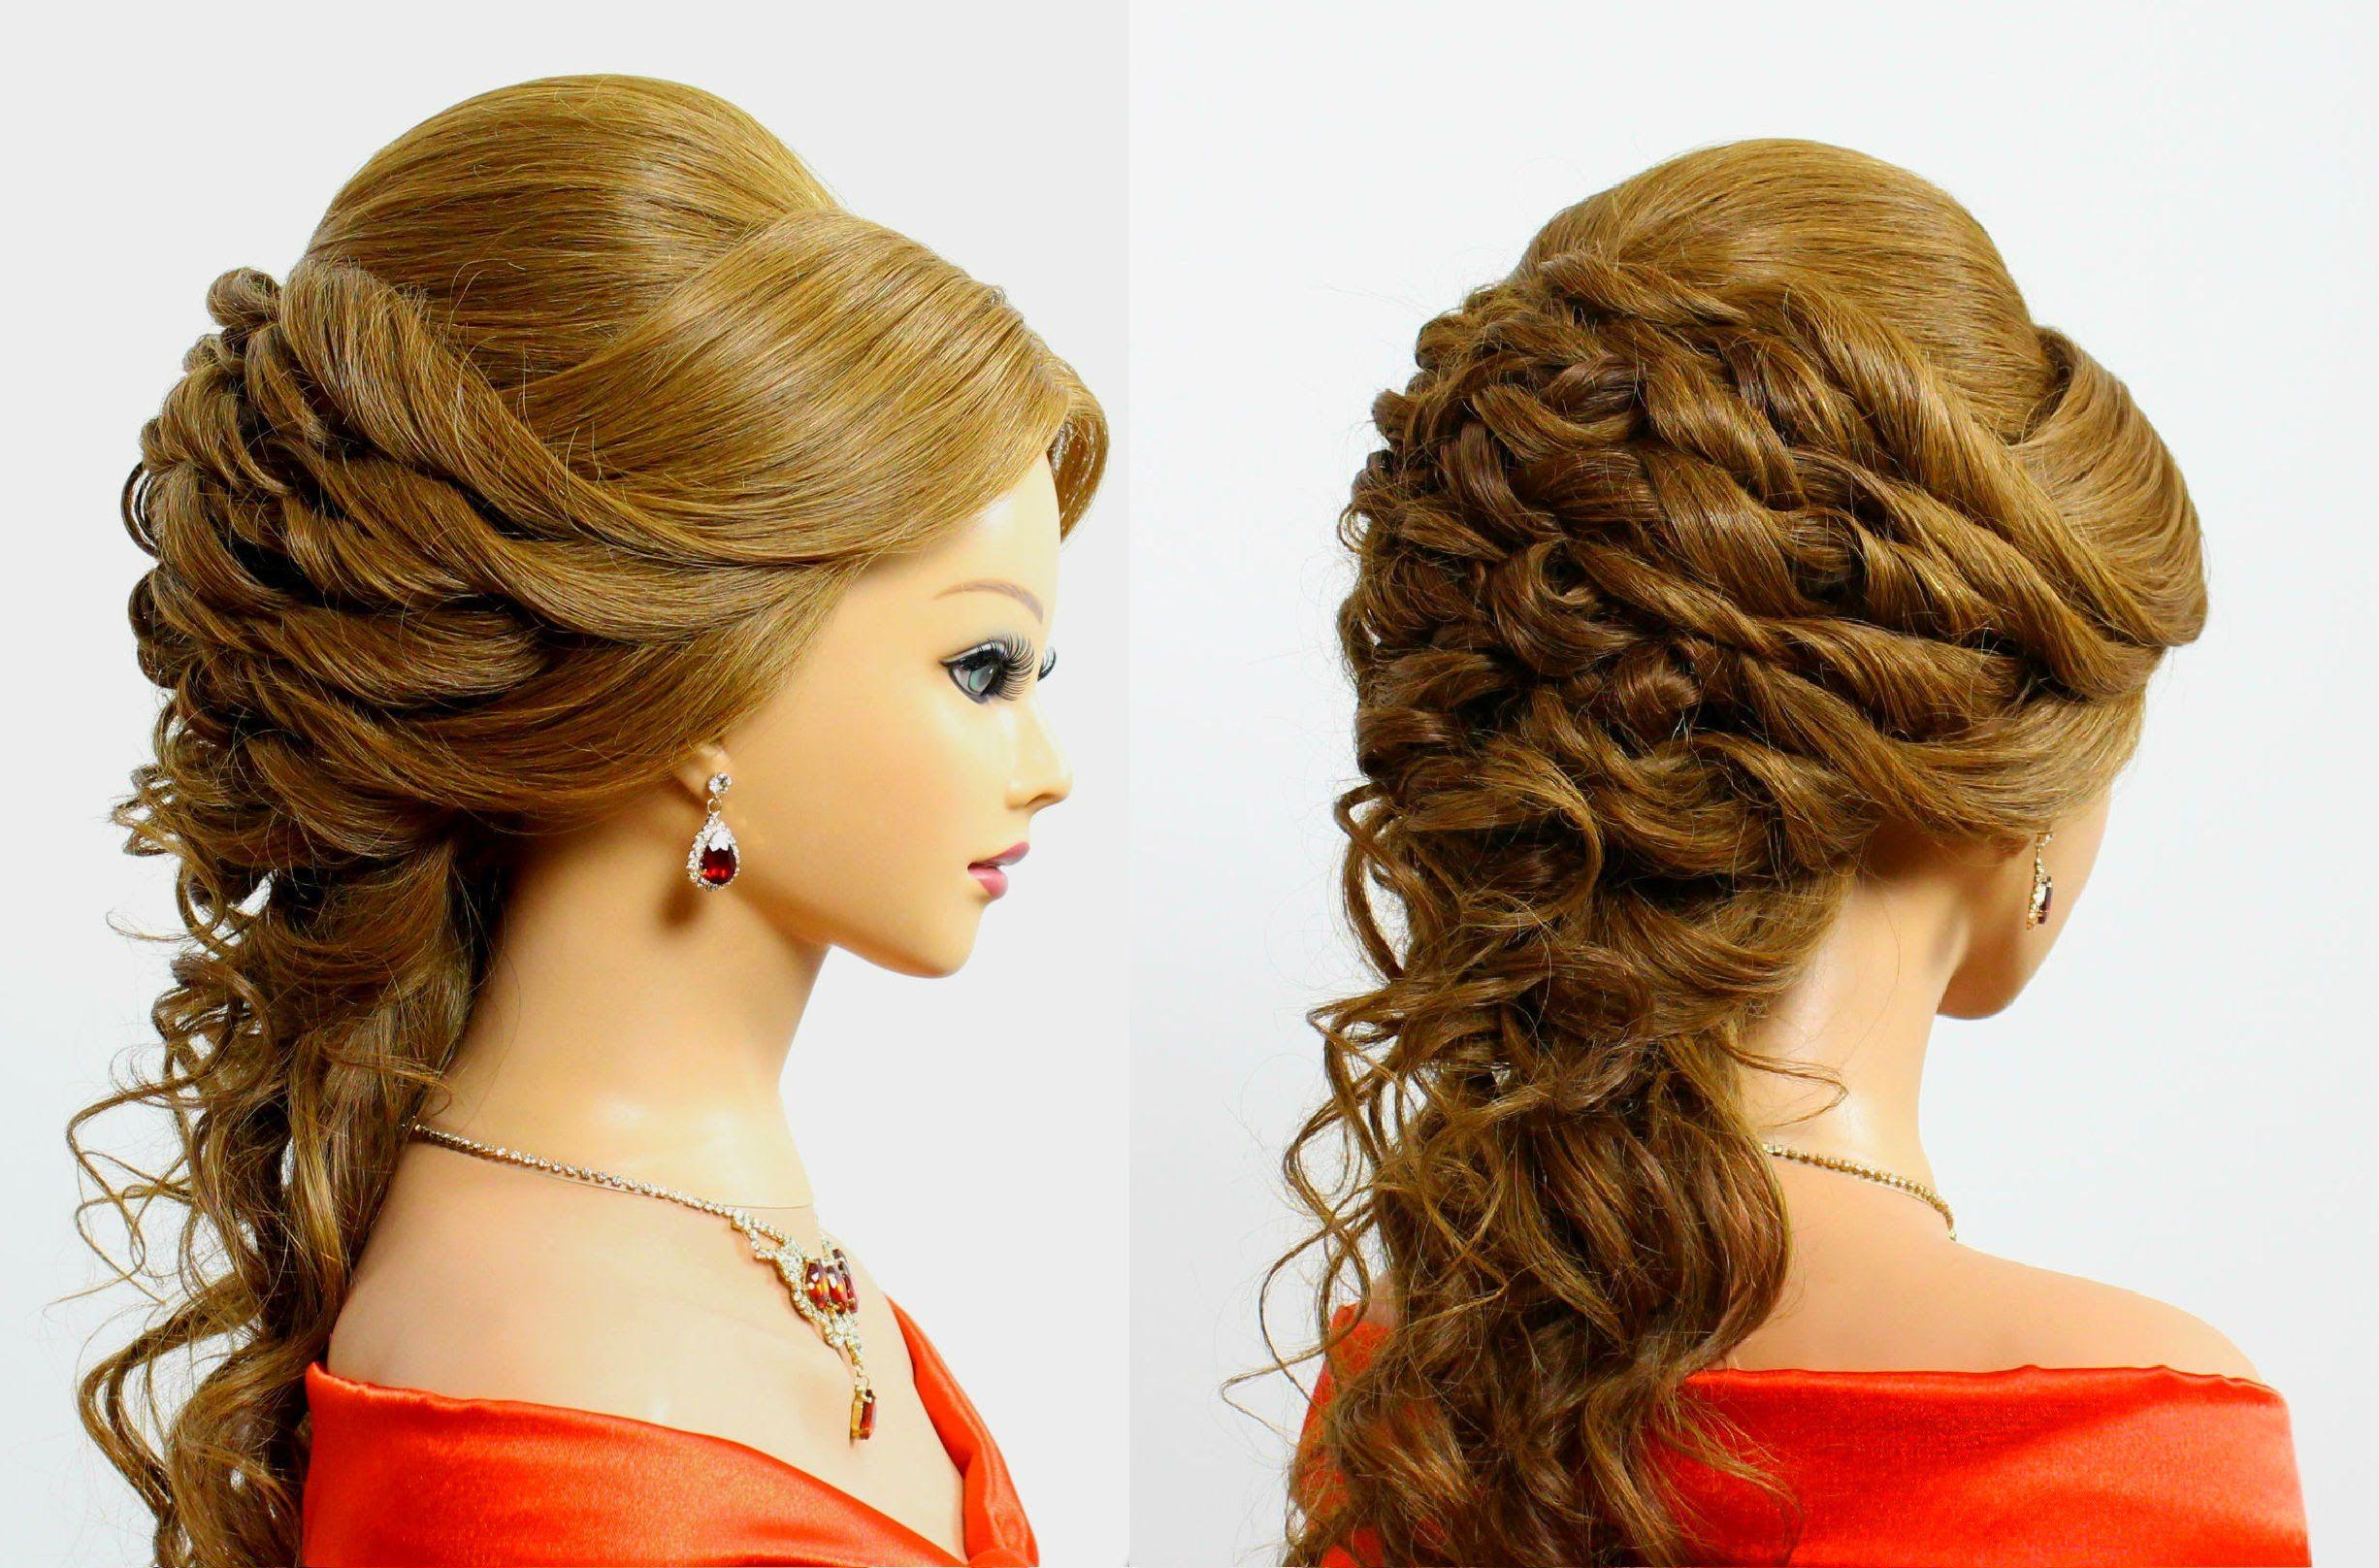 hairstyles for medium long hair. bridal wedding hairstyles. | Школа